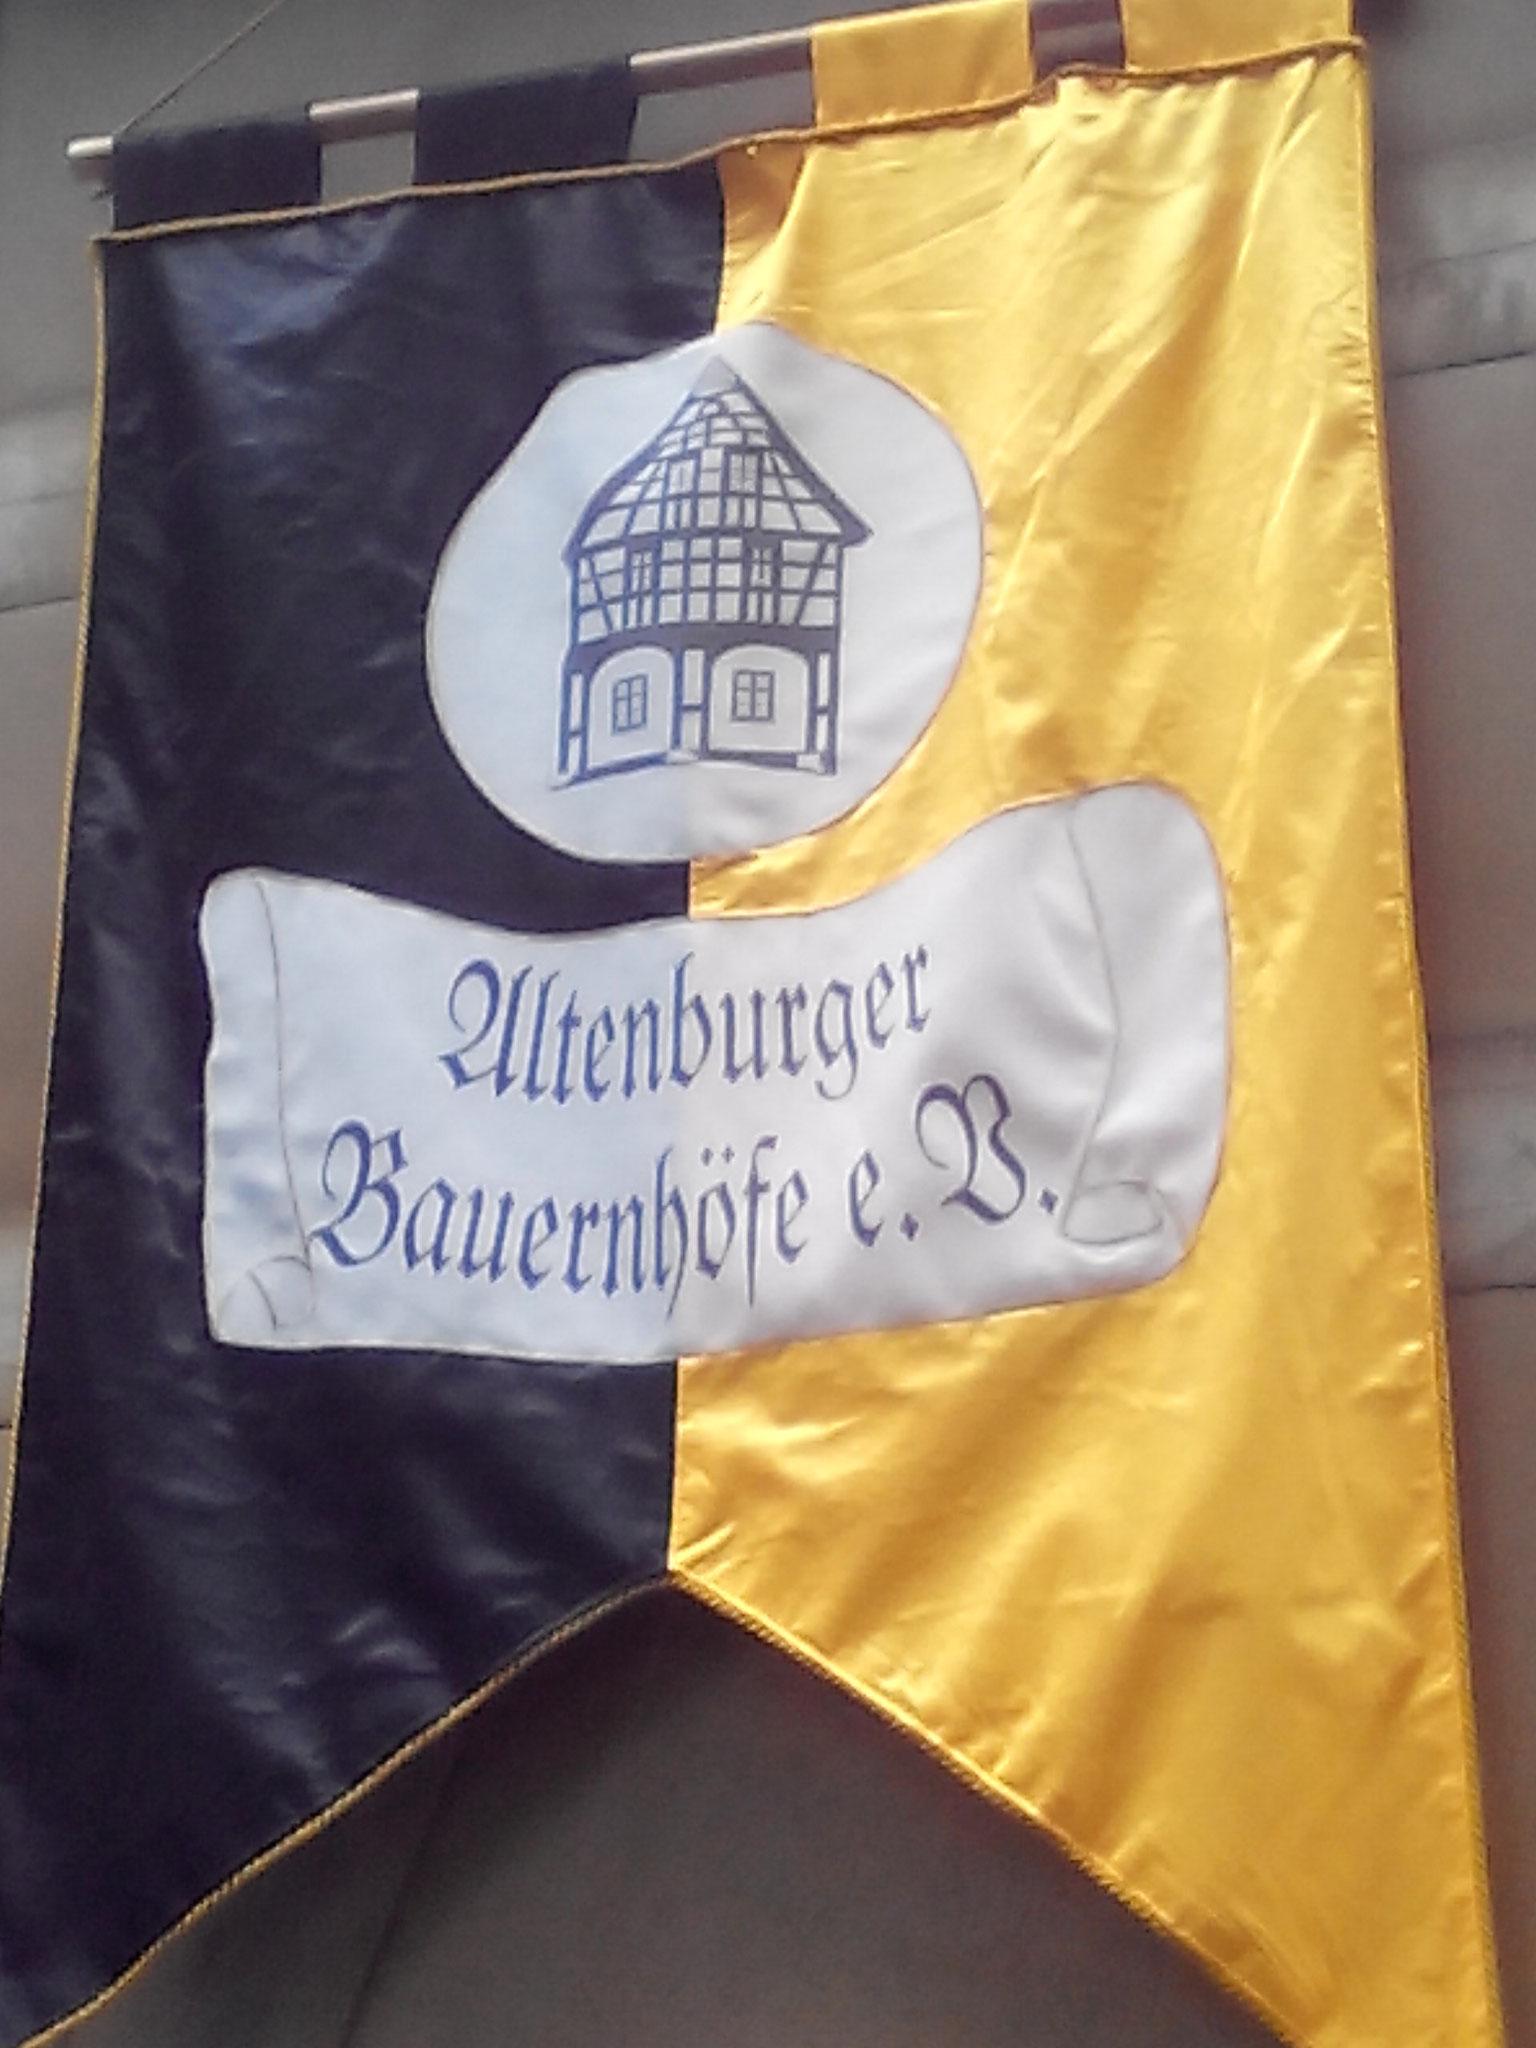 Die Flagge des Vereins